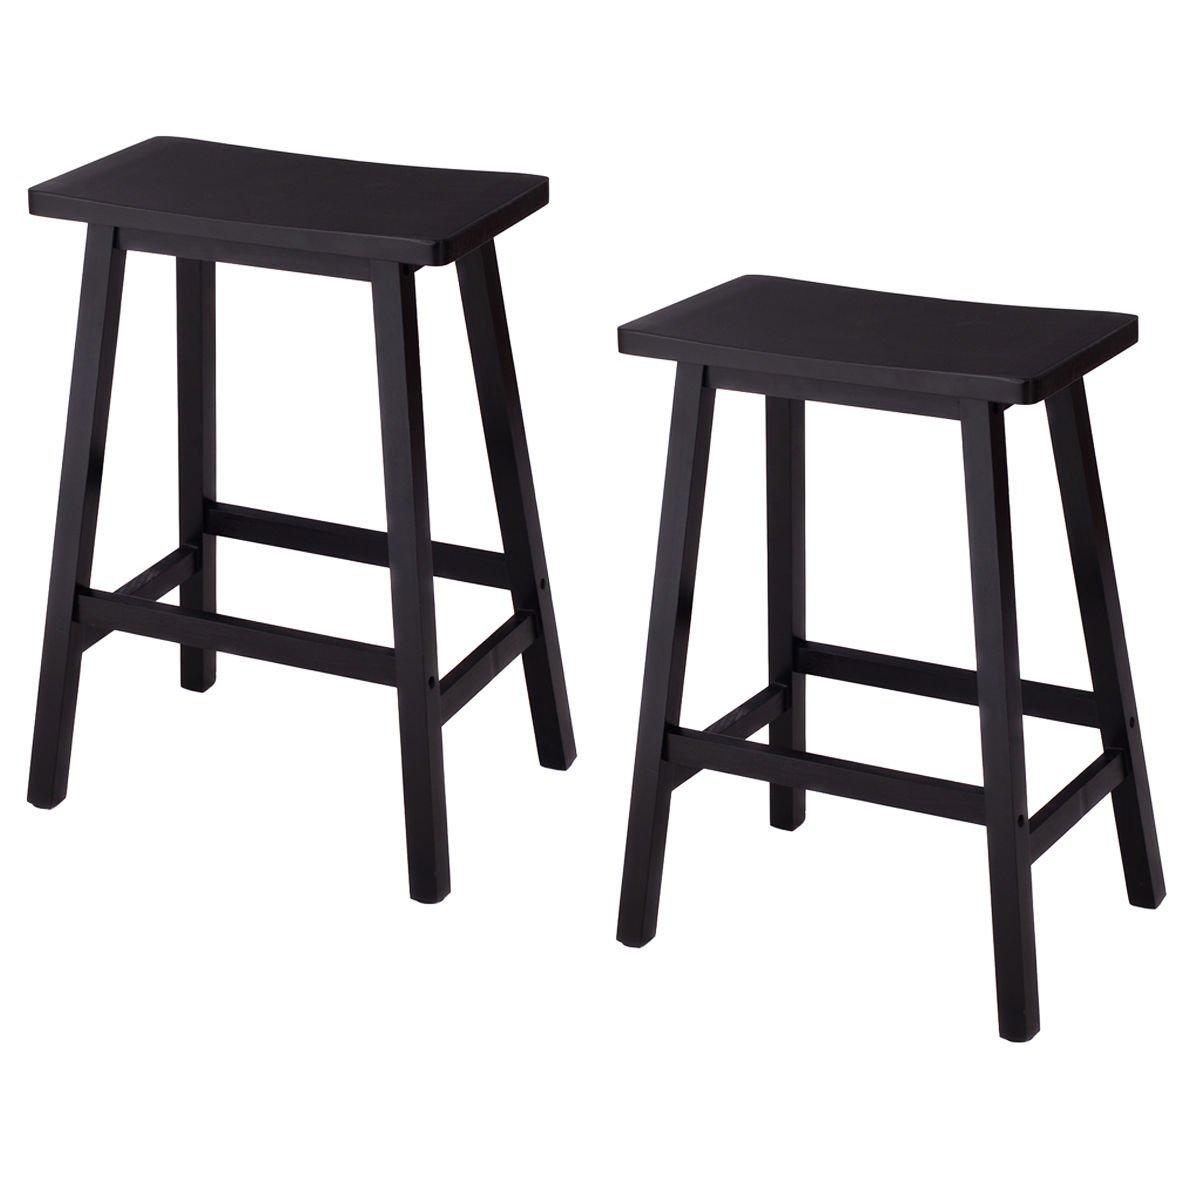 Ktaxon Set Of 2 Saddle Seat 24 Bar Stools Wood Dining Room Kitchen